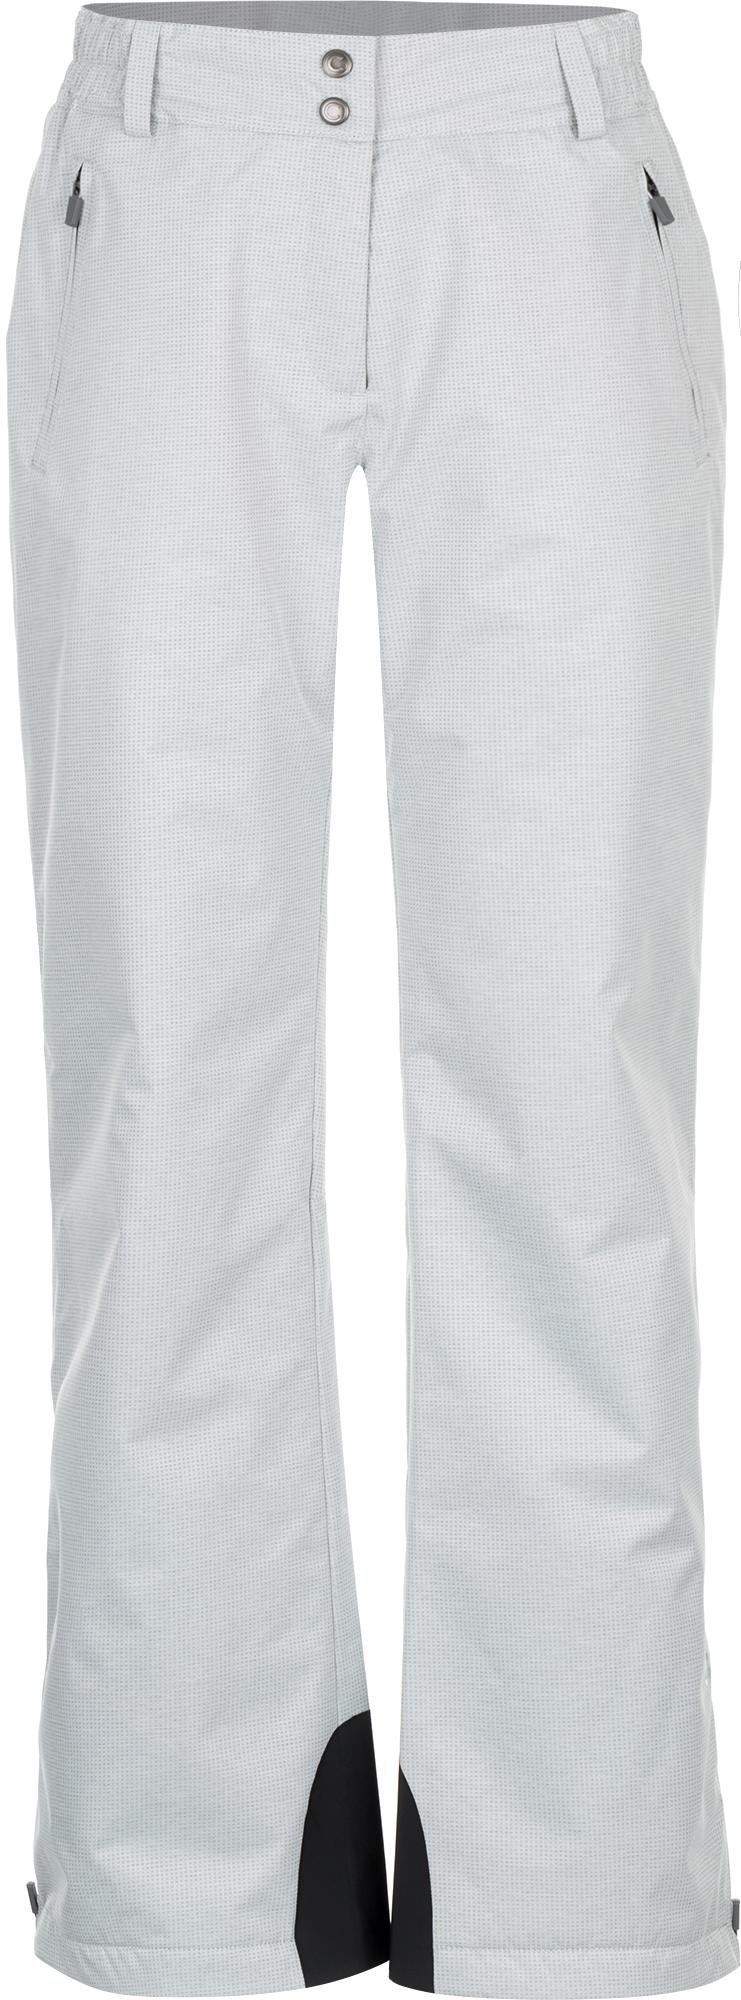 Colmar Брюки утепленные женские Colmar Textured Target футболка colmar футболка